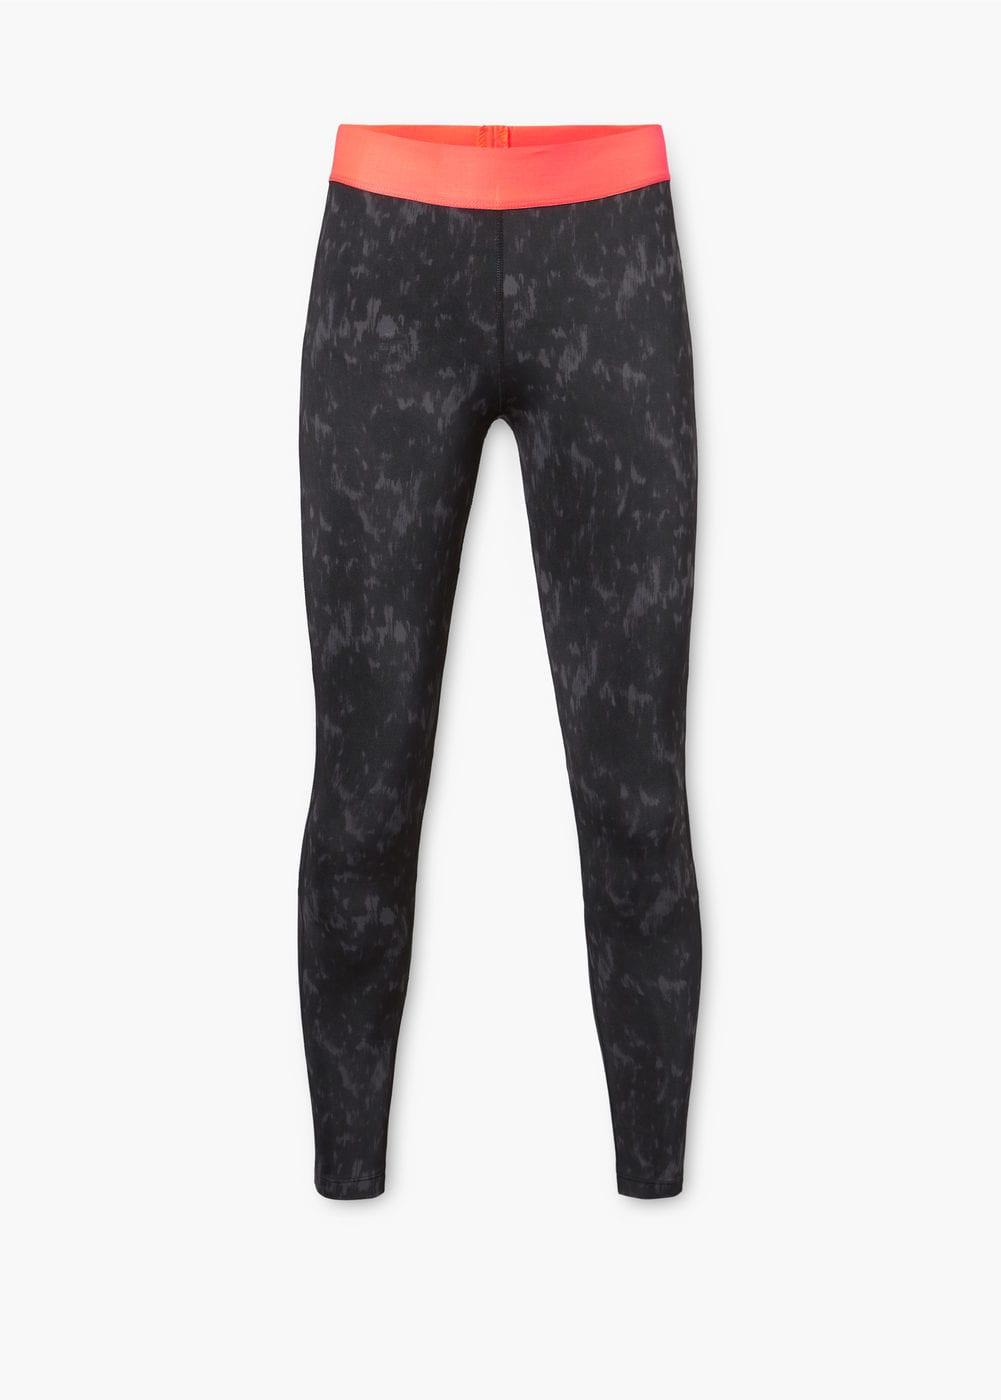 Ropa deporte para mujer pantalones